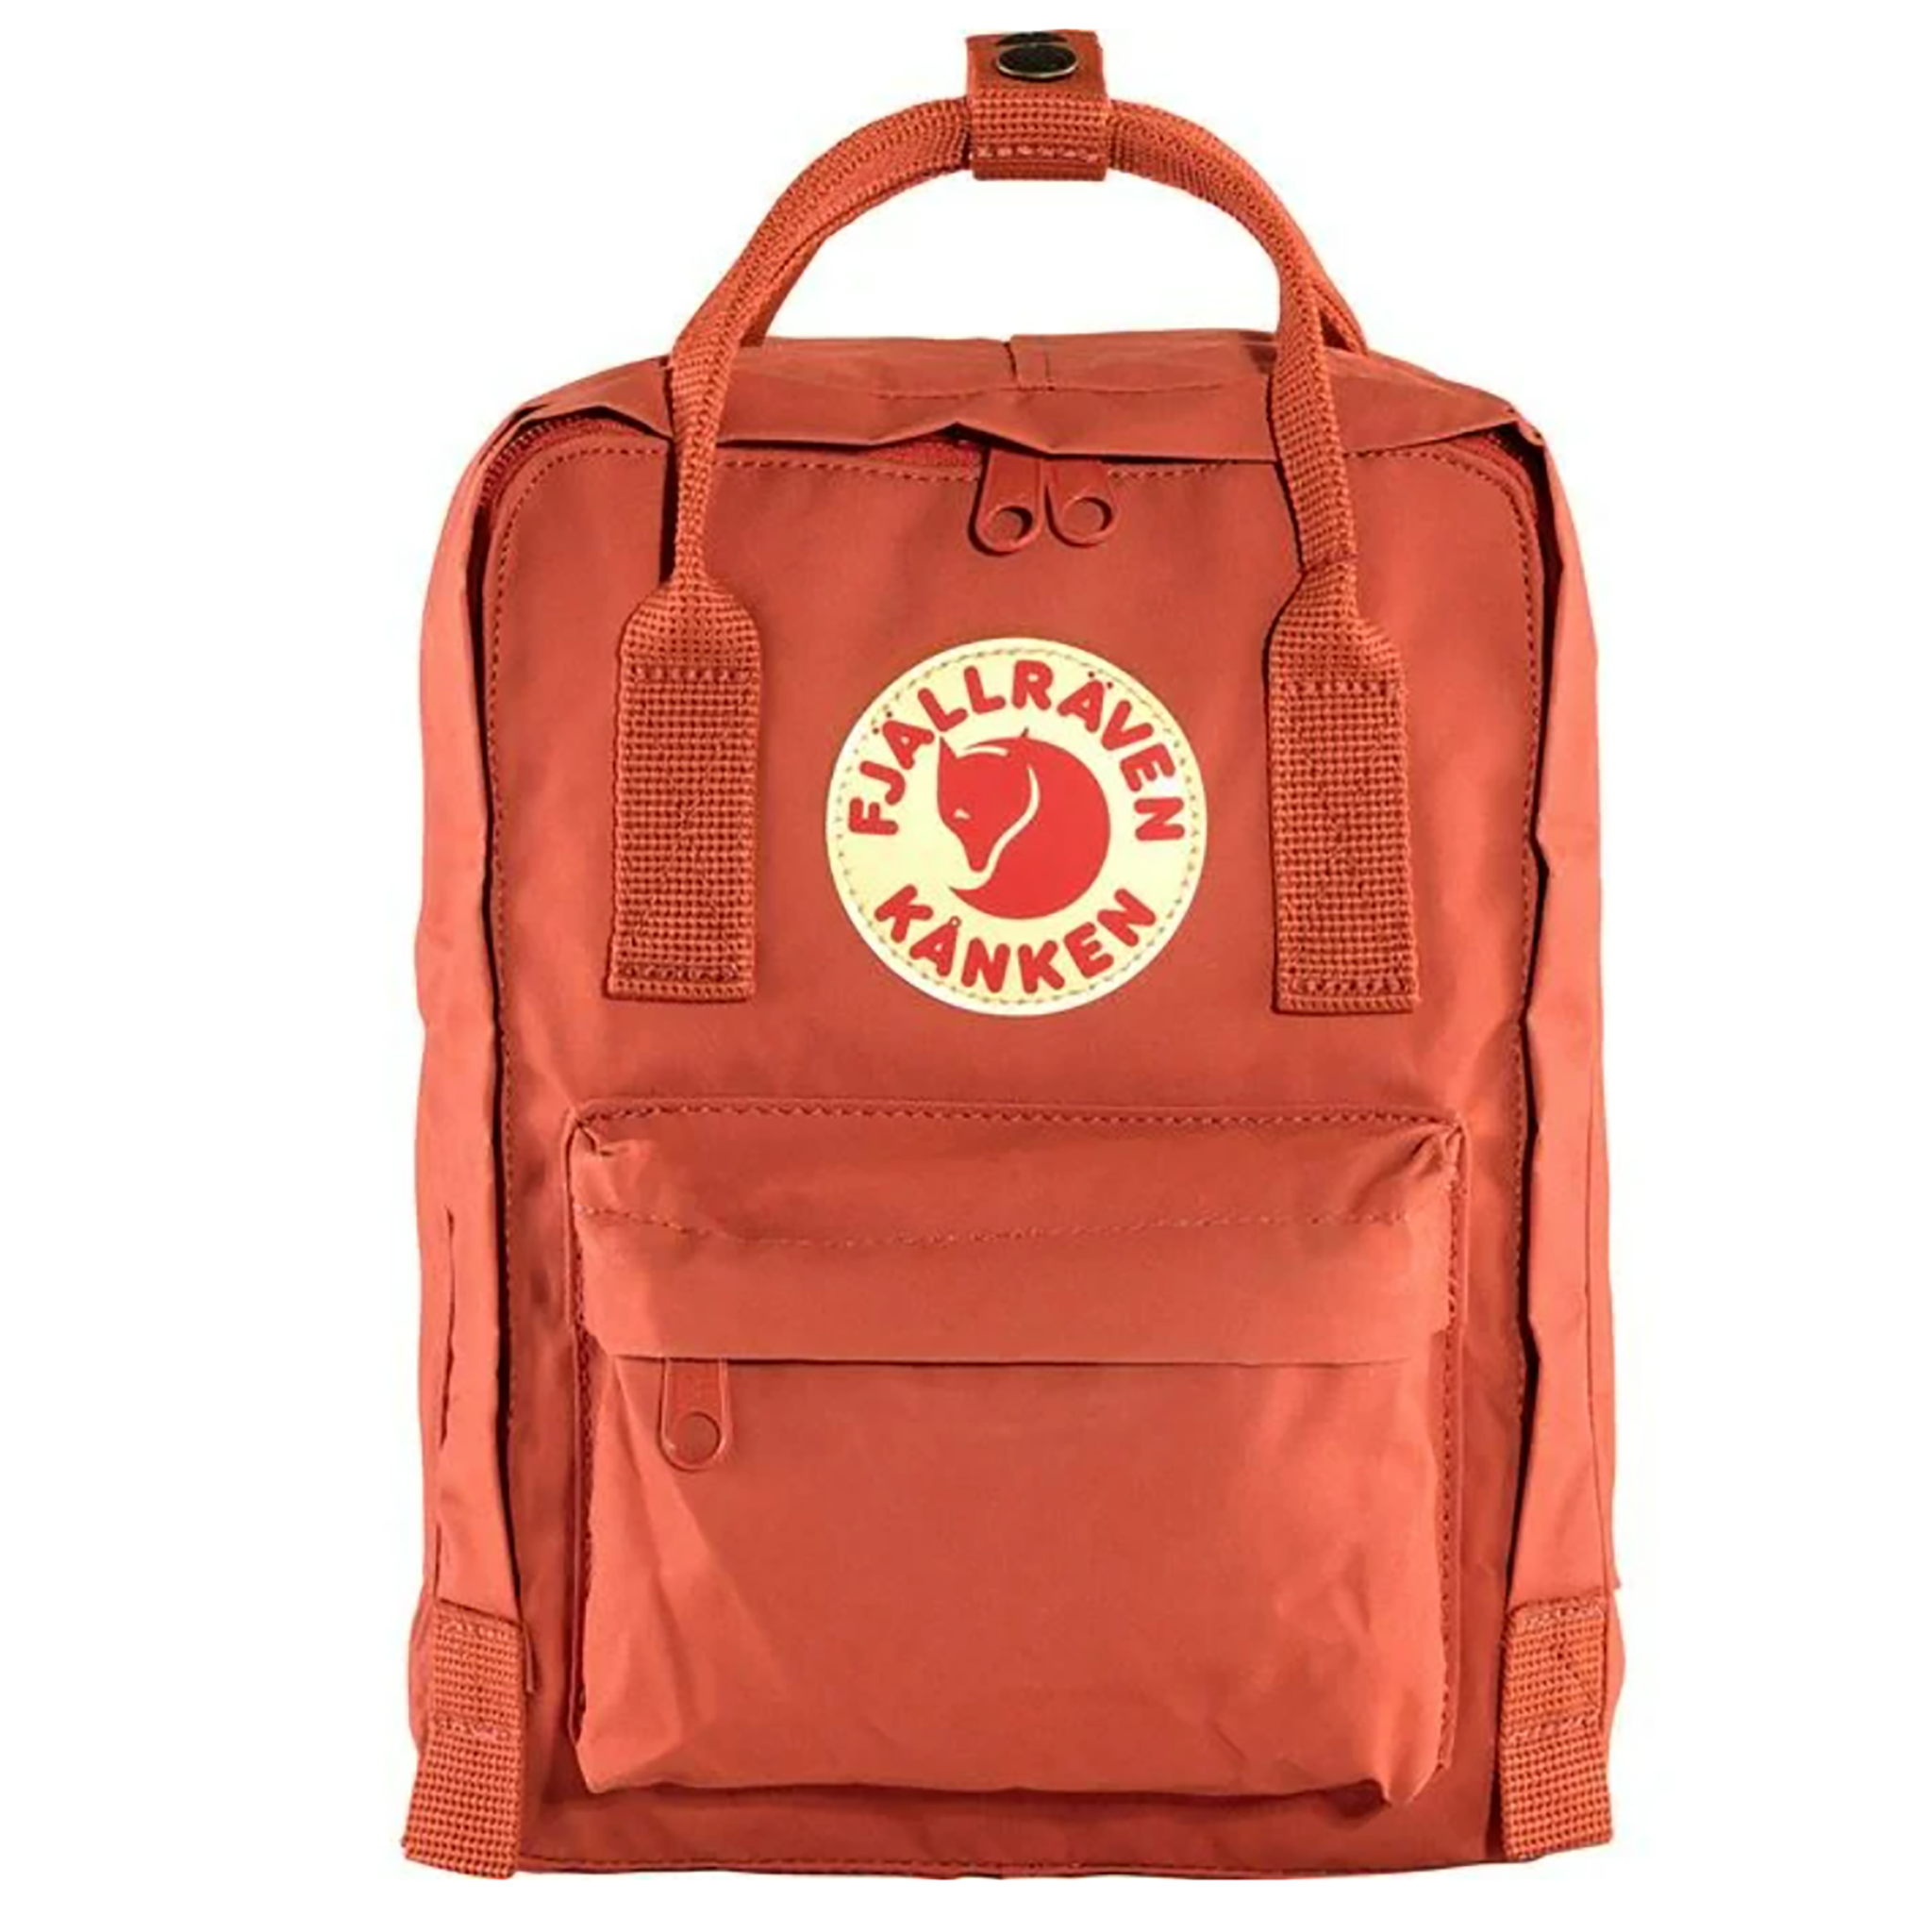 Kanken Mini 333 - Rowan Red-1